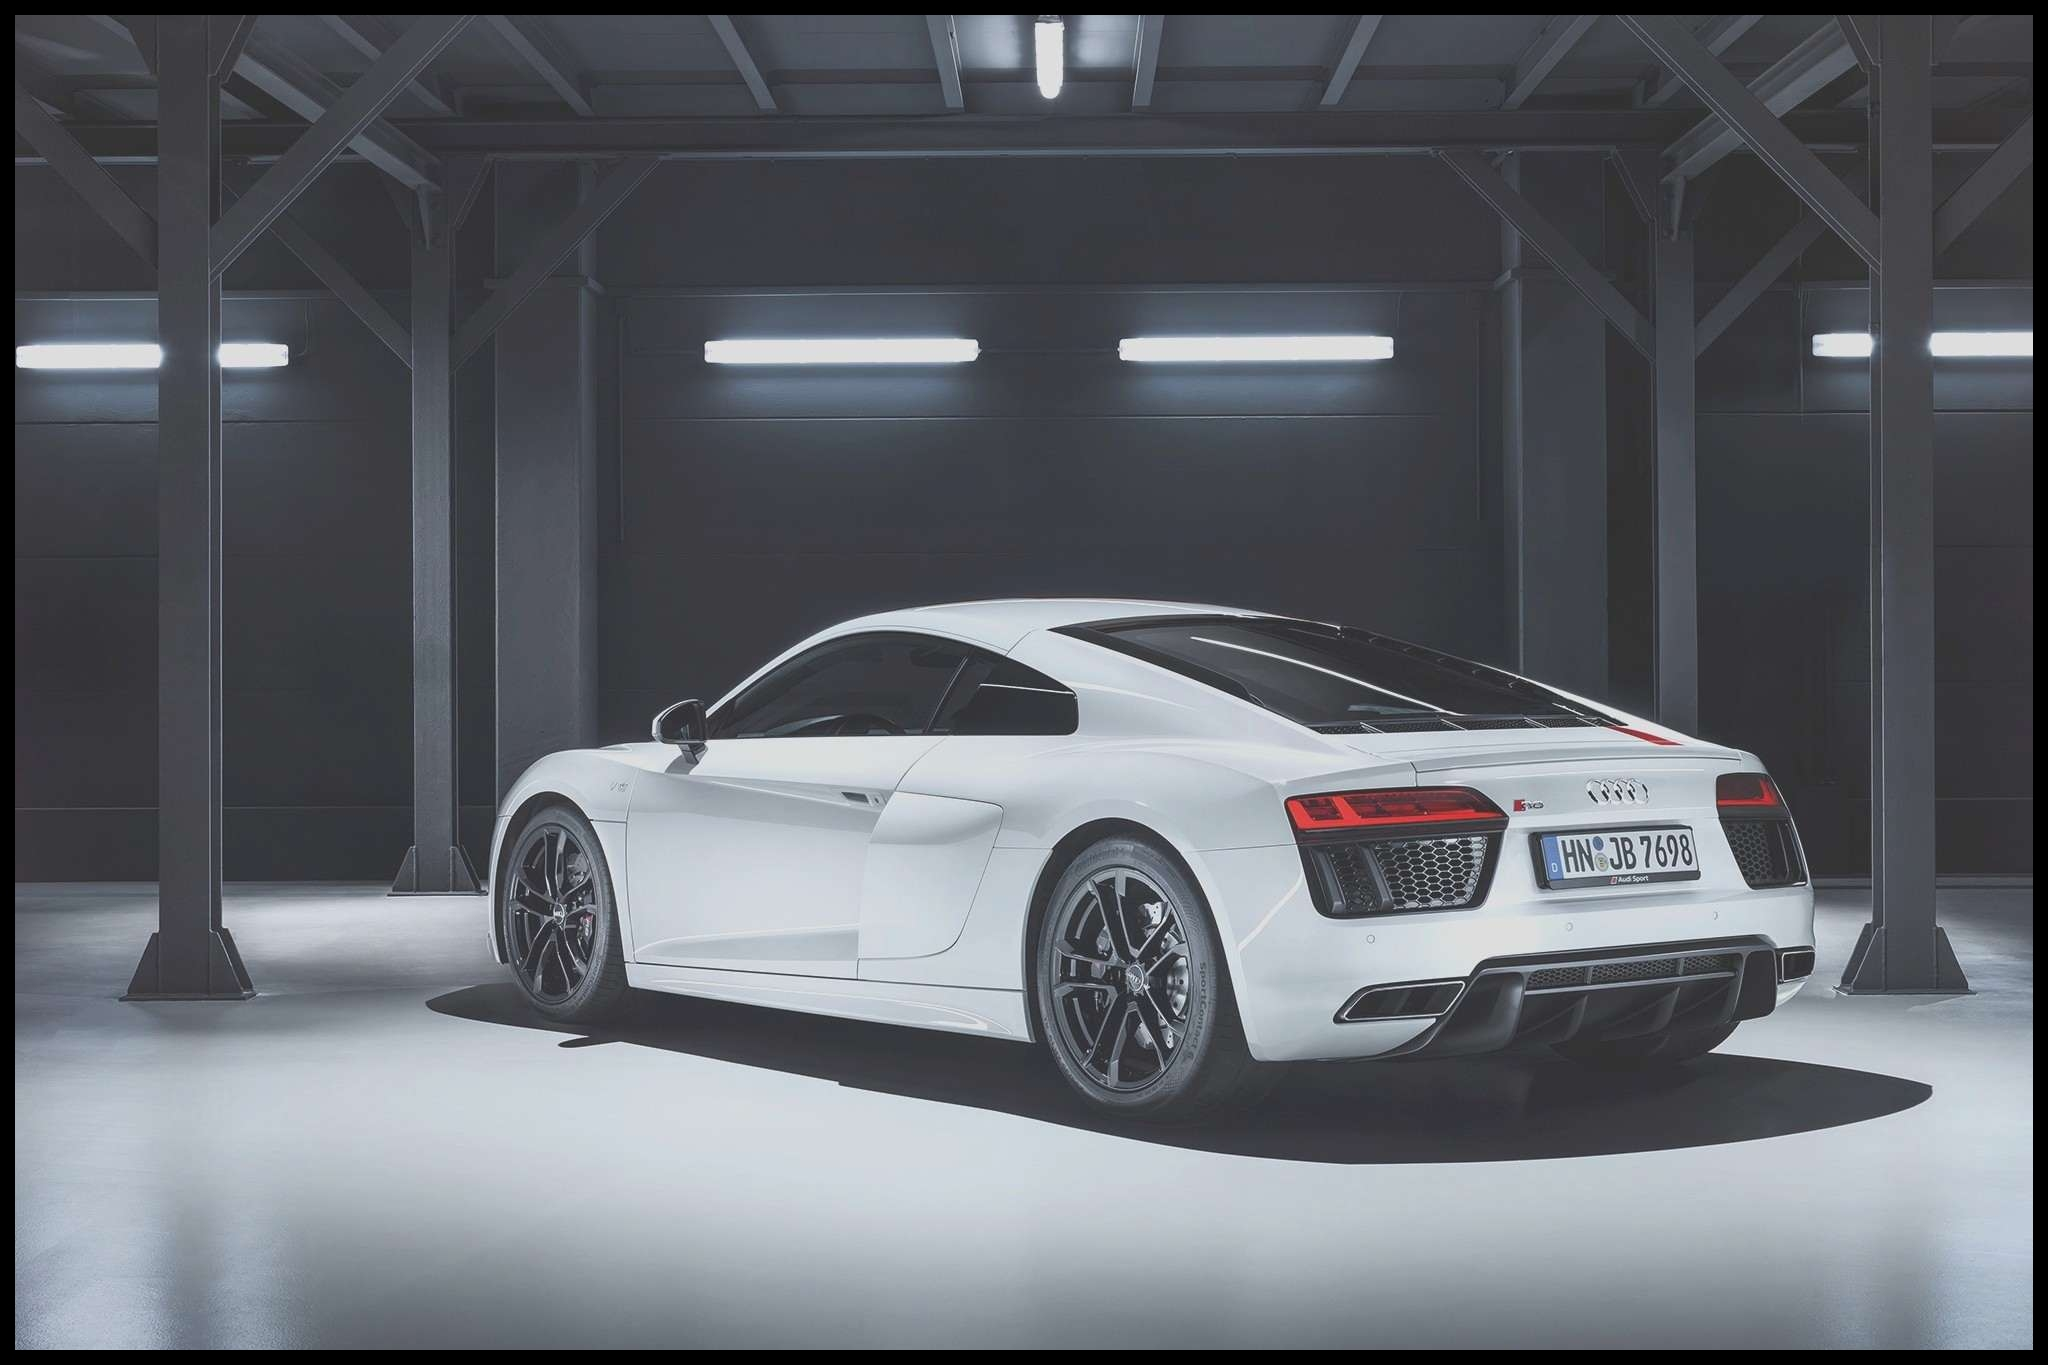 2014 Audi R8 0 60 Audi R8 V10 0 60 Elegant Peachtree Password Recovery V1 0d